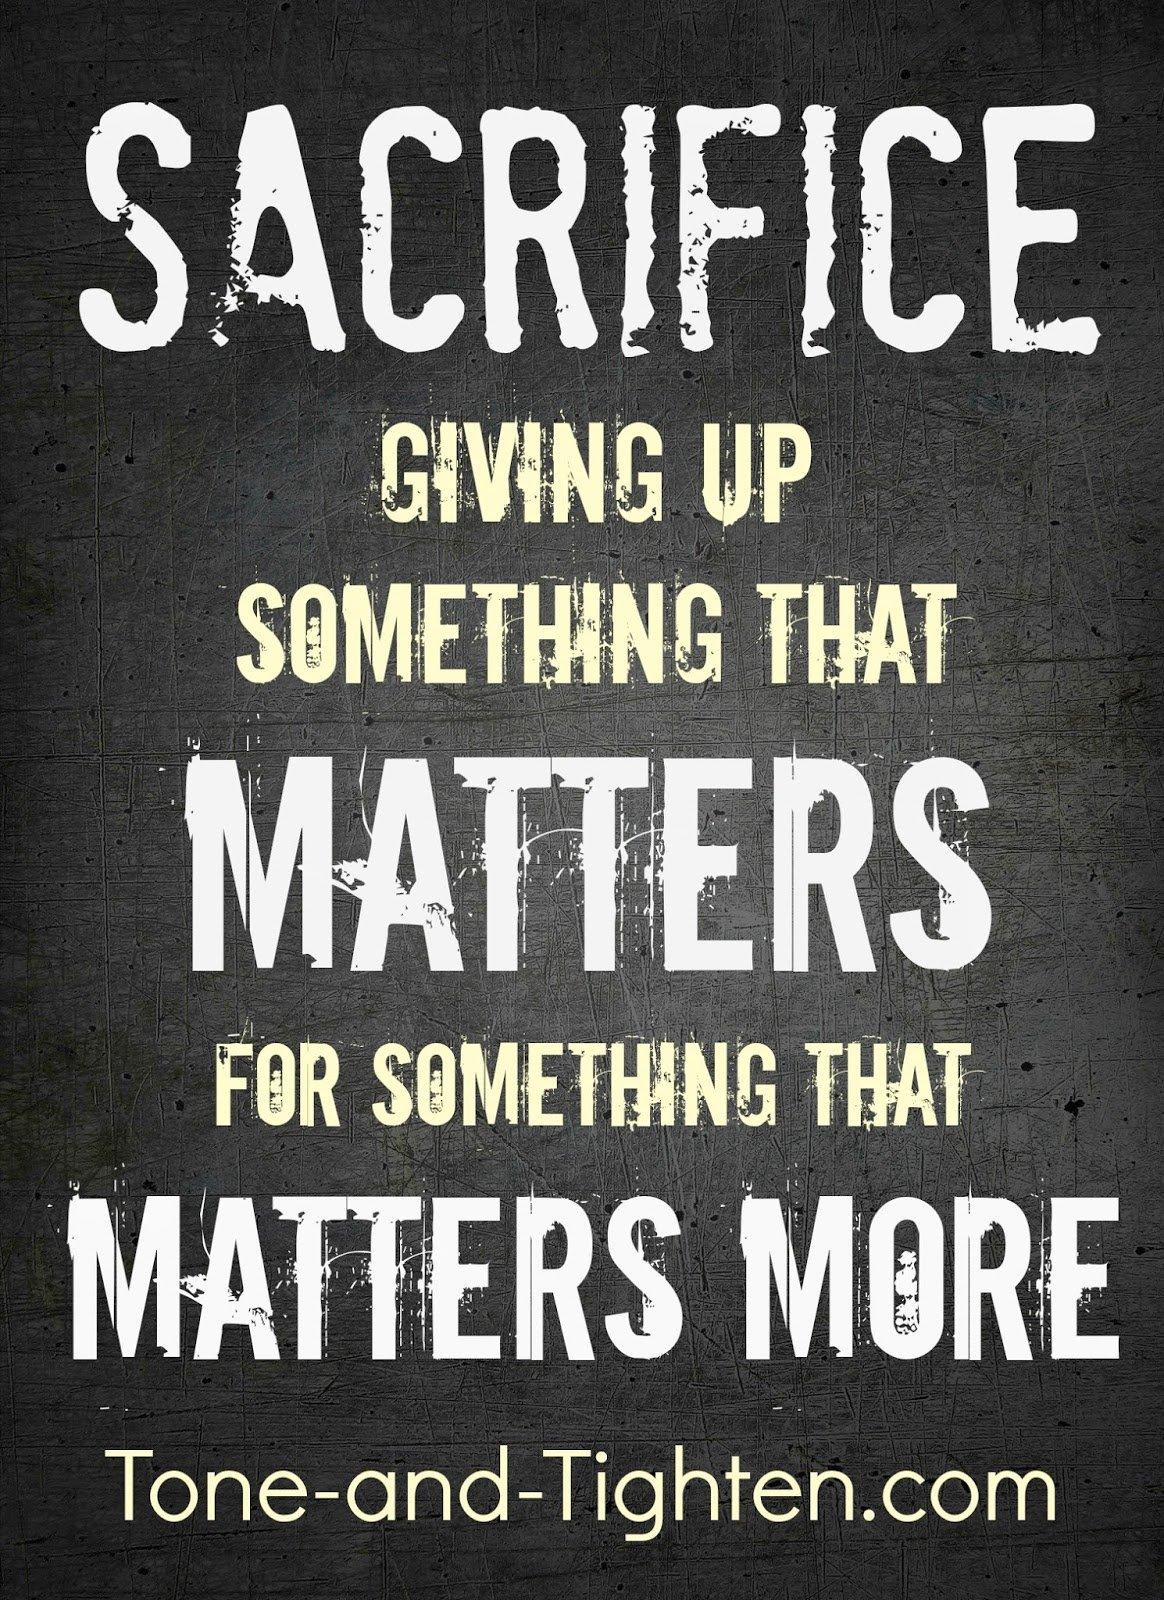 Inspirational Quotes About Motivation: Motivational Quotes On Sacrifices. QuotesGram